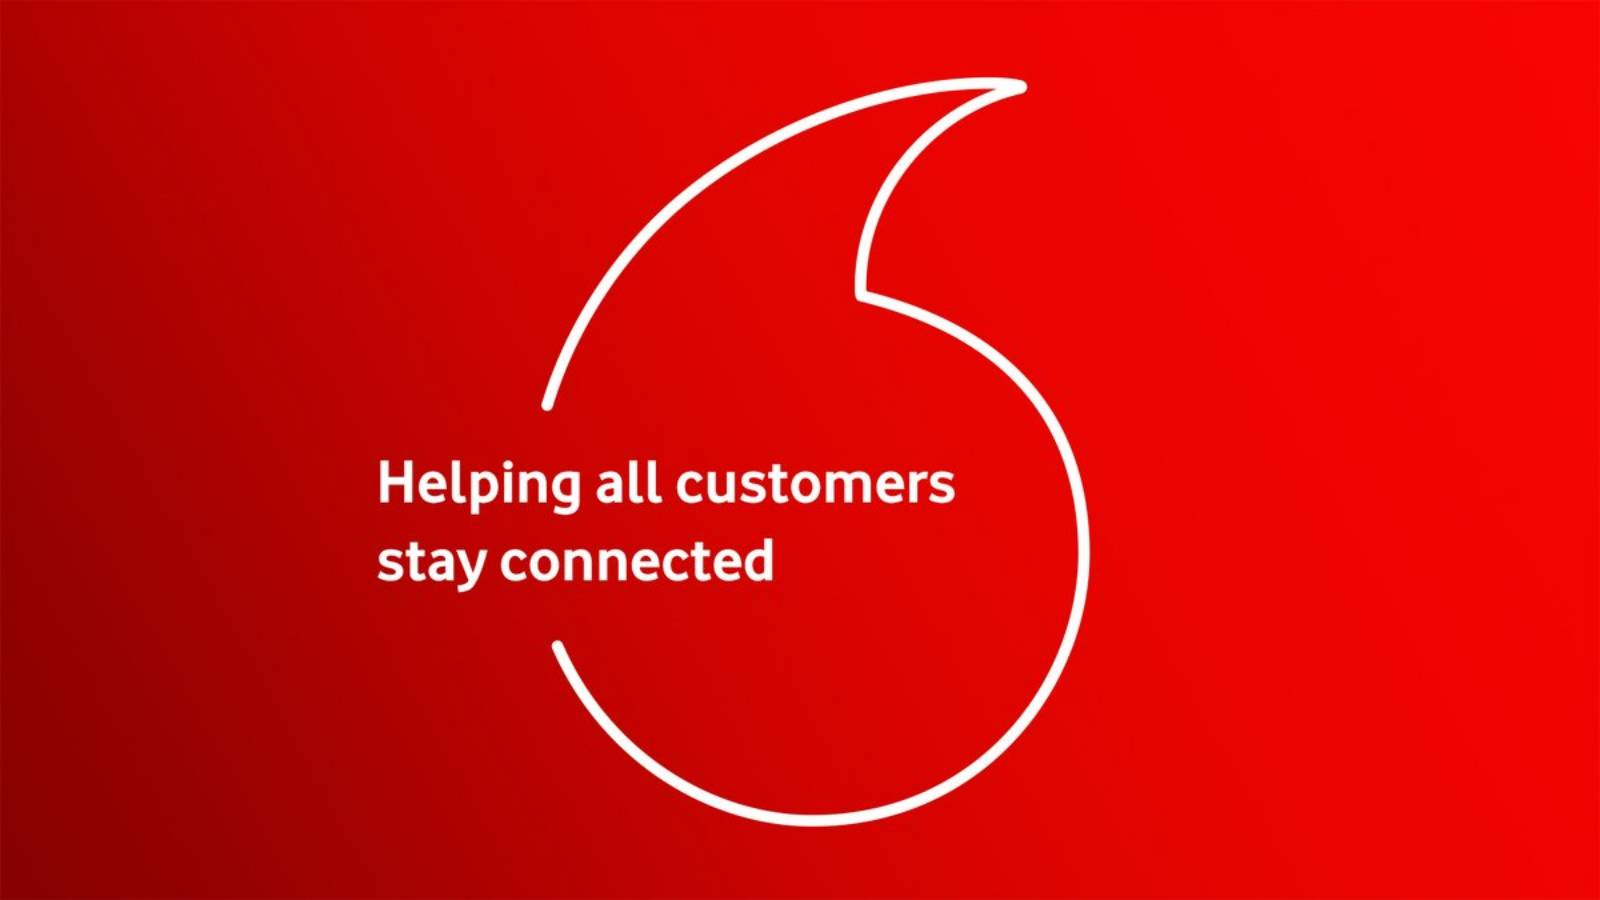 Vodafone desene